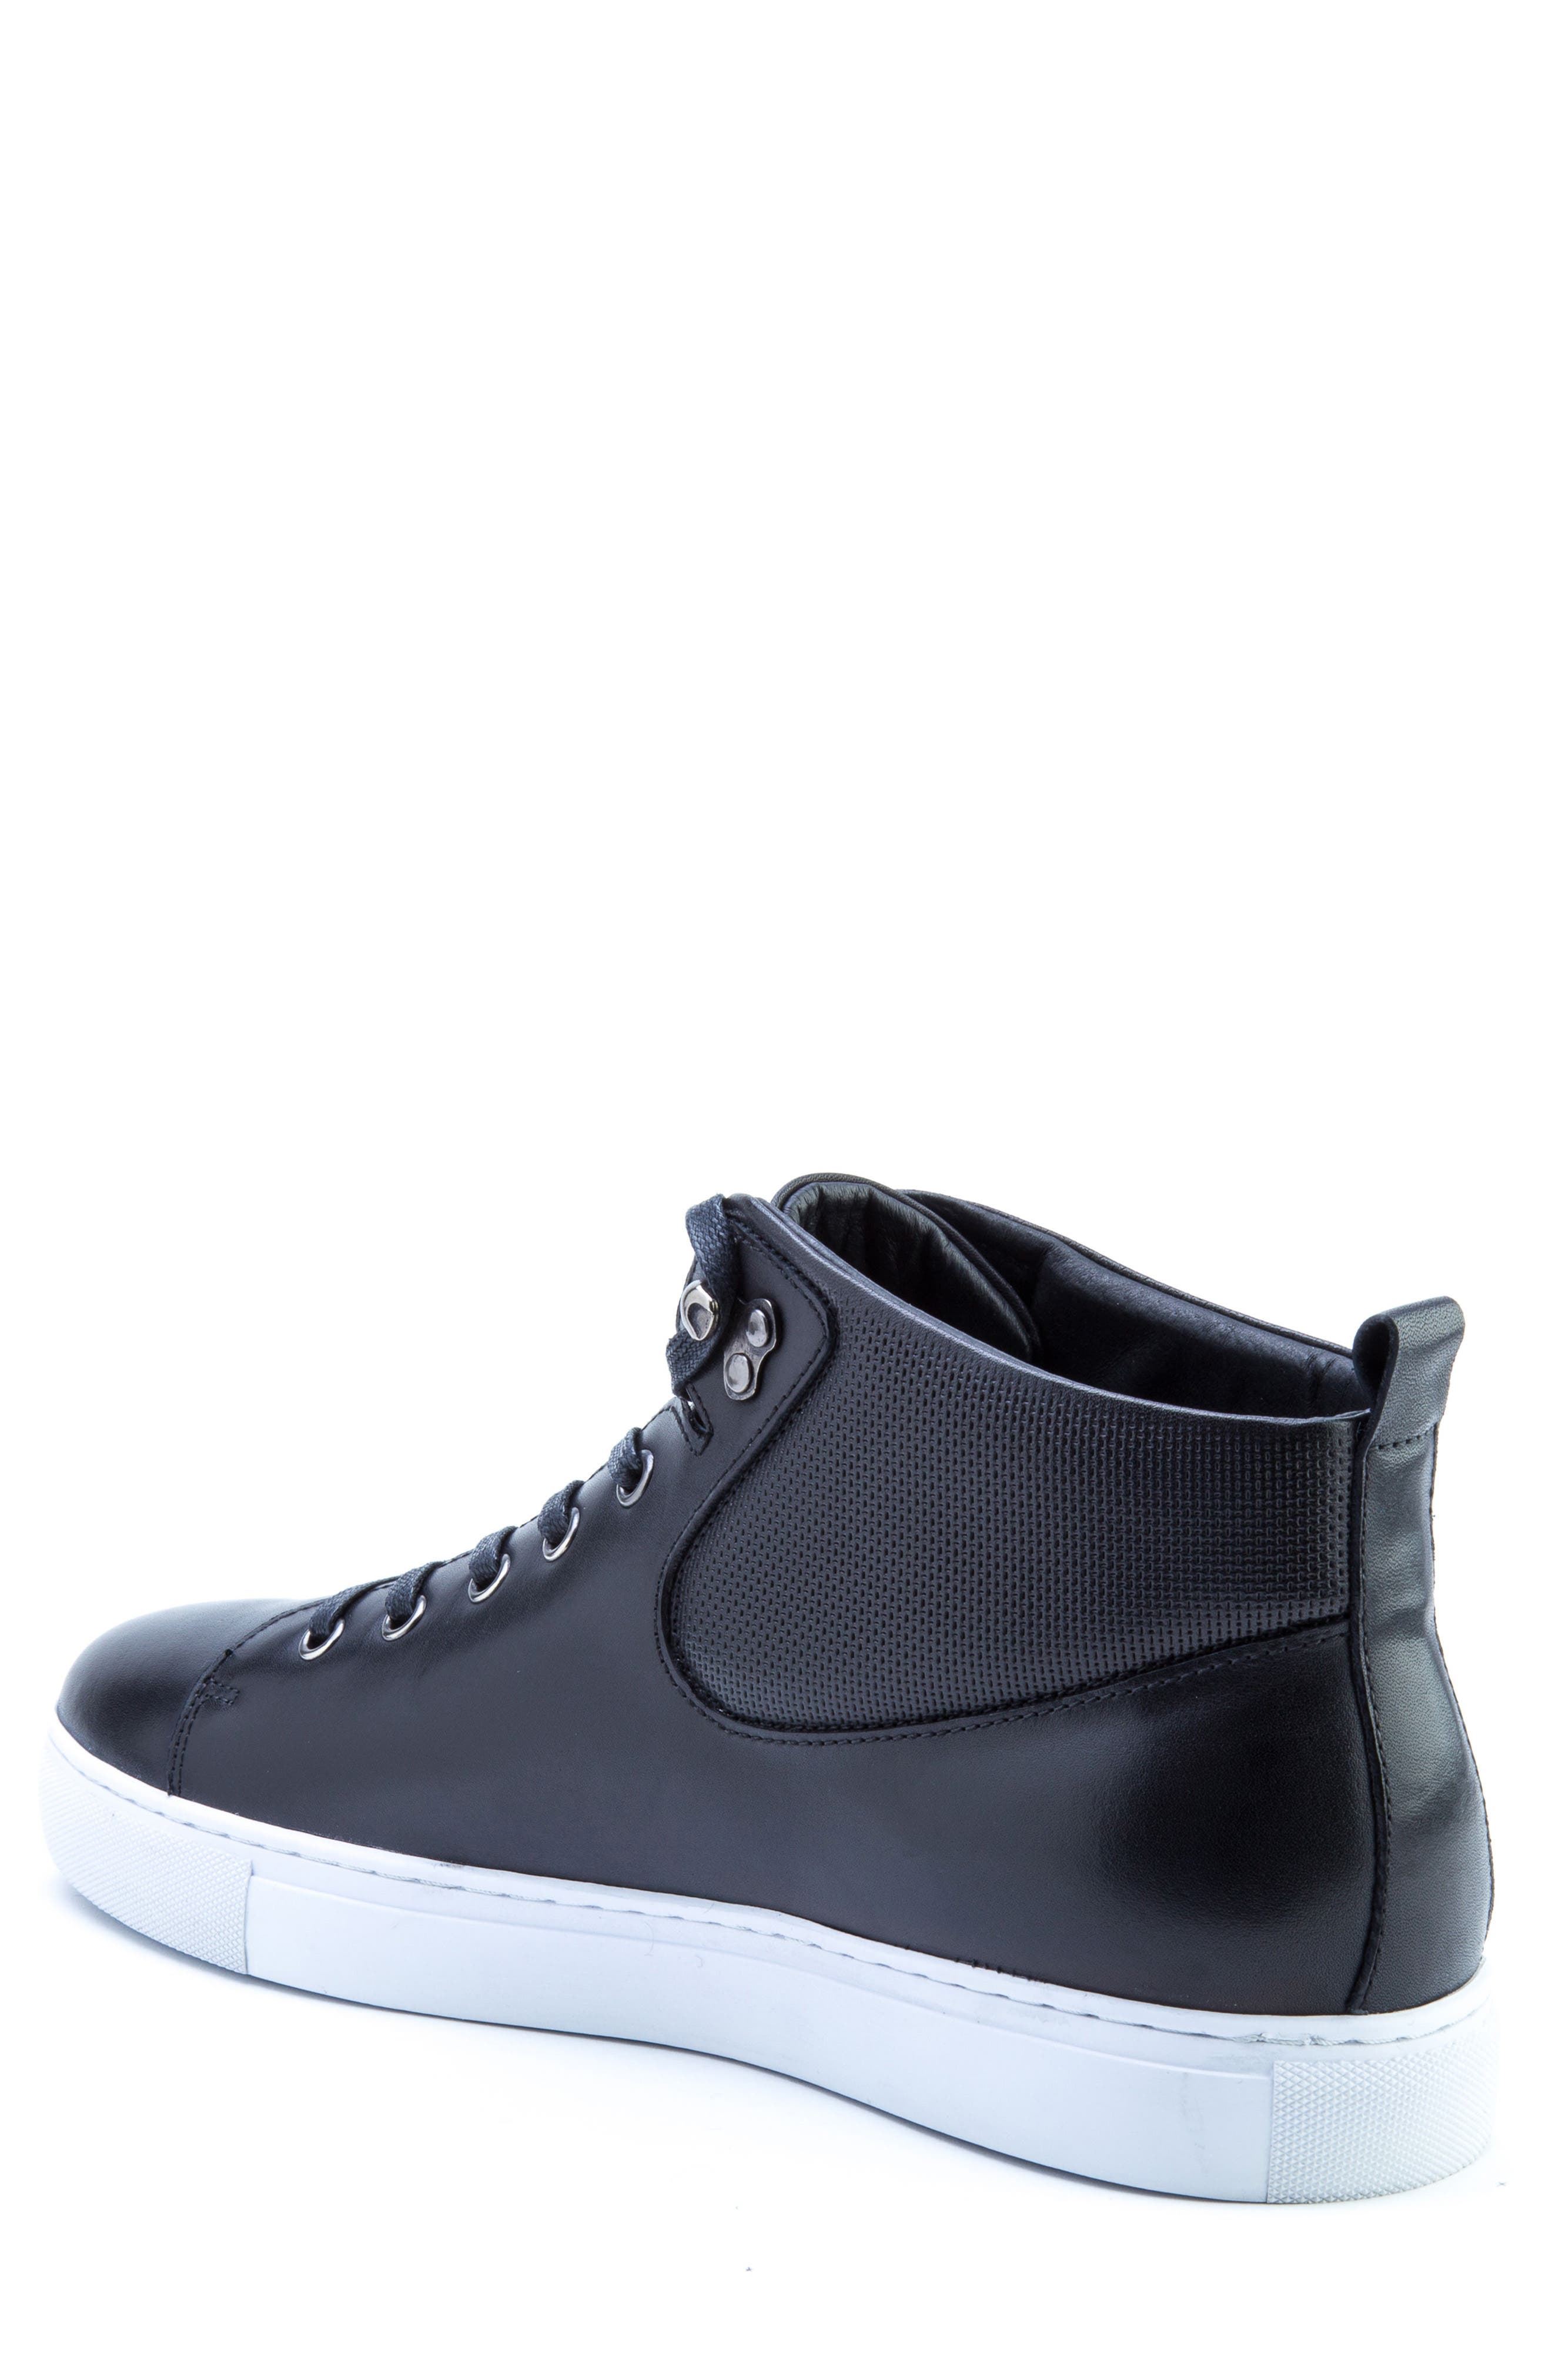 Sanders Sneaker,                             Alternate thumbnail 2, color,                             Black Leather